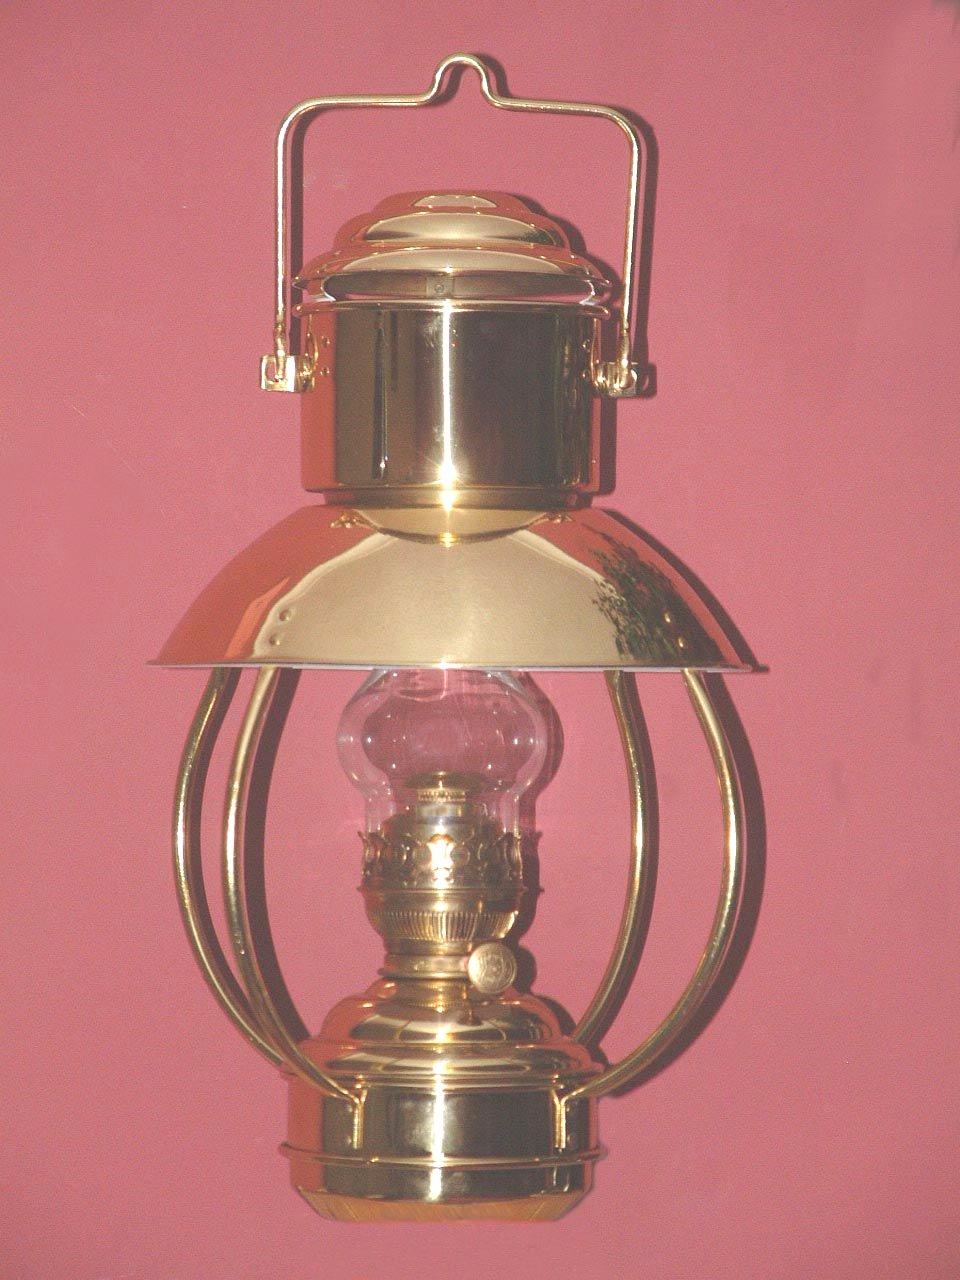 Wells Fargo Oil Lamp